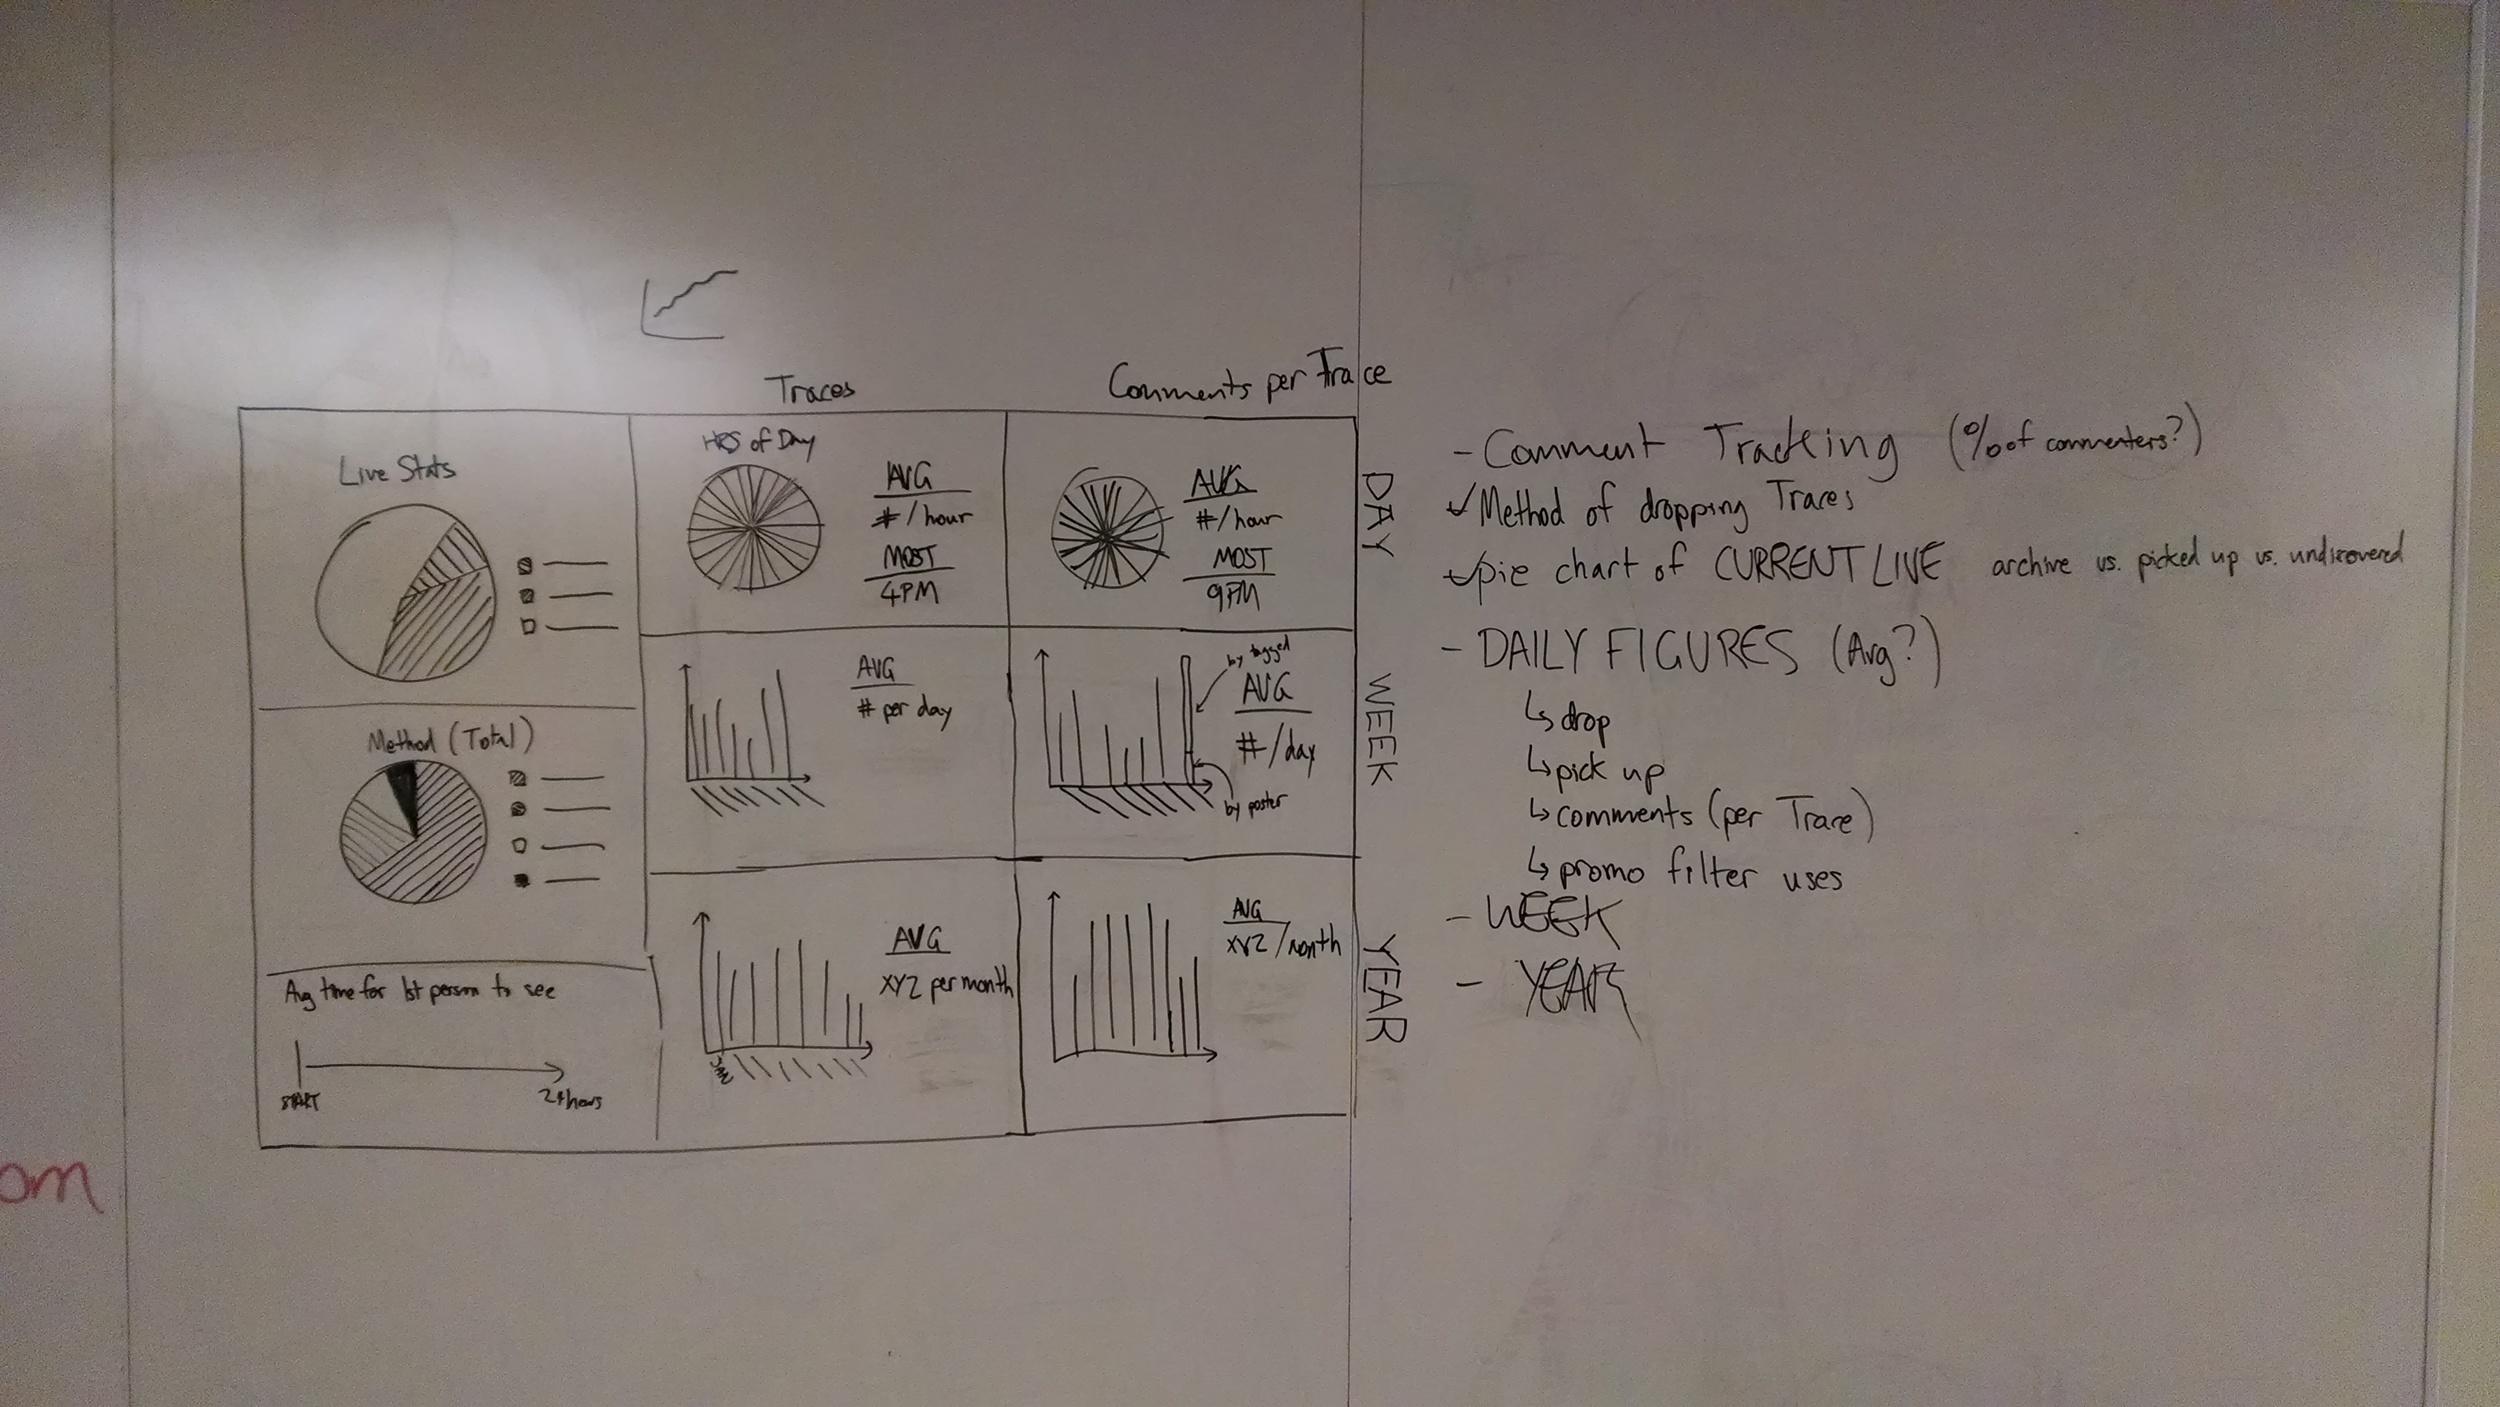 Whiteboarding a low fidelity dashboard design